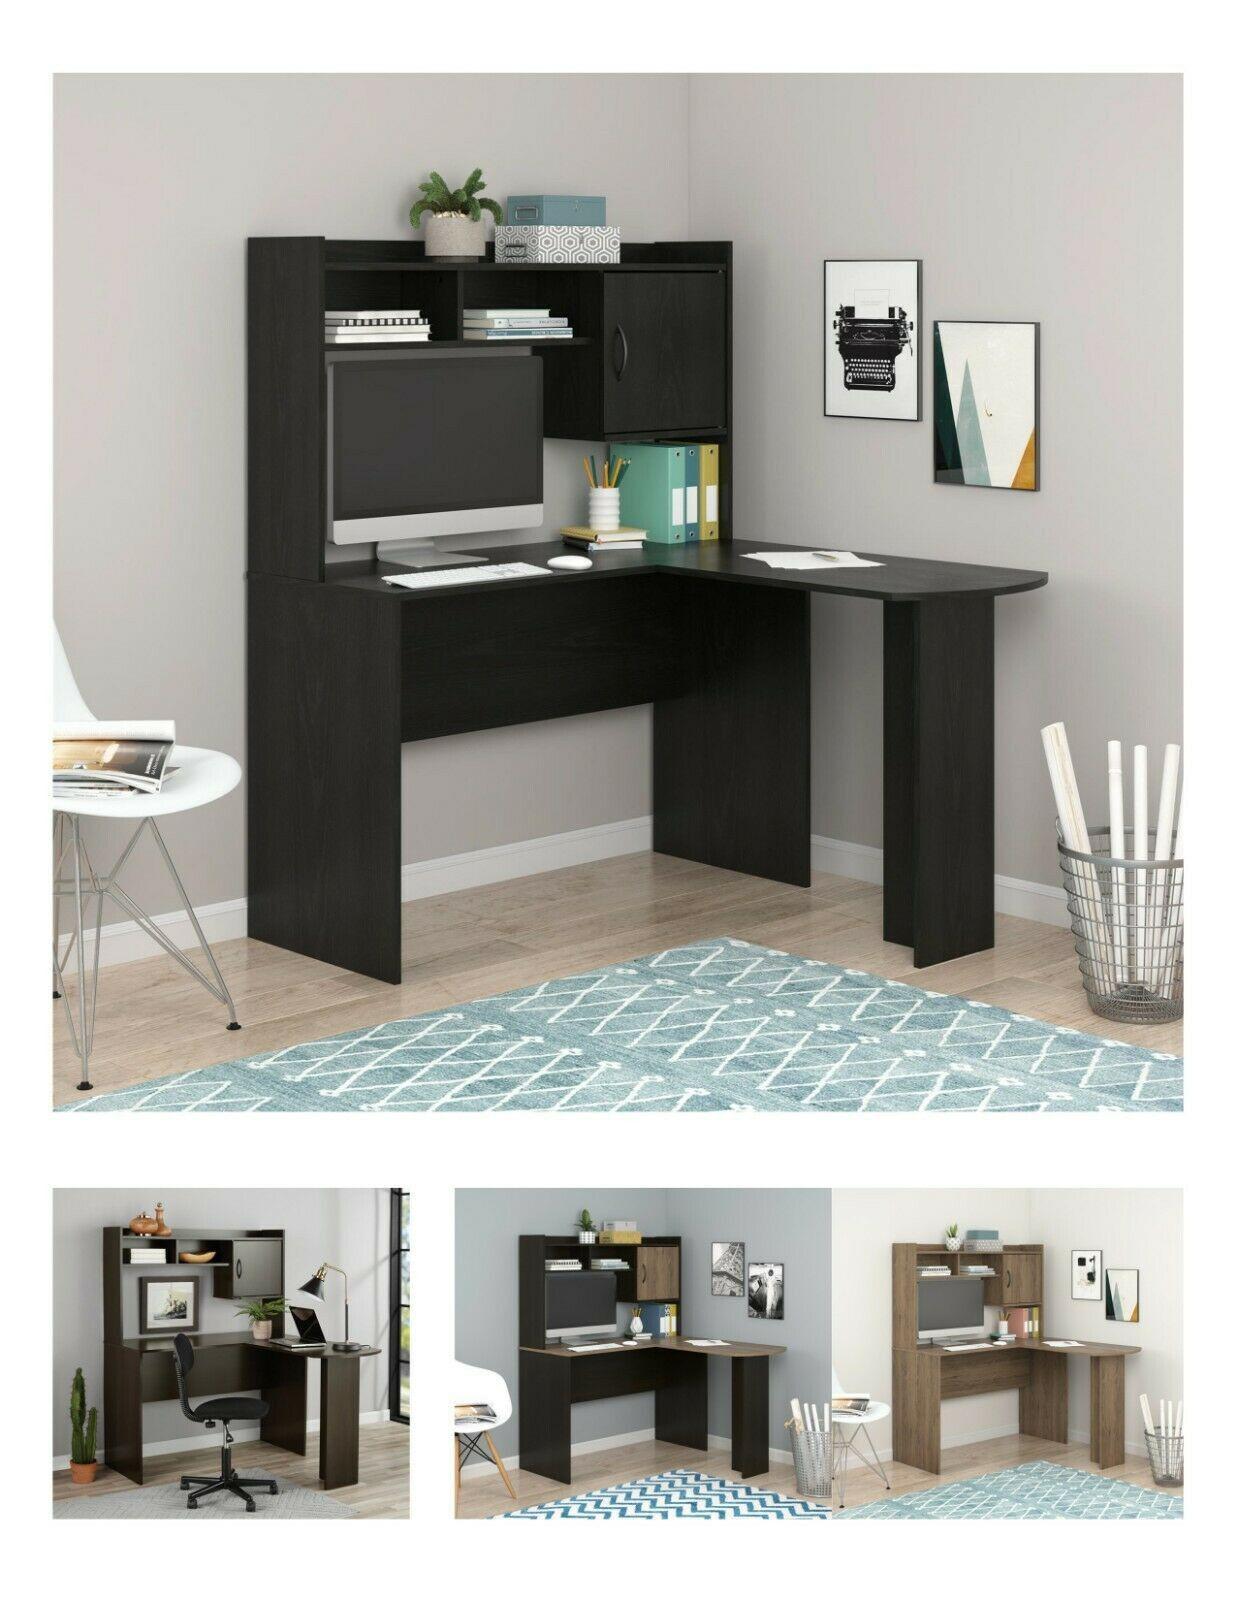 Ameriwood Home Dakota L Shaped Desk With Bookshelves Espresso 2020 Di 2020